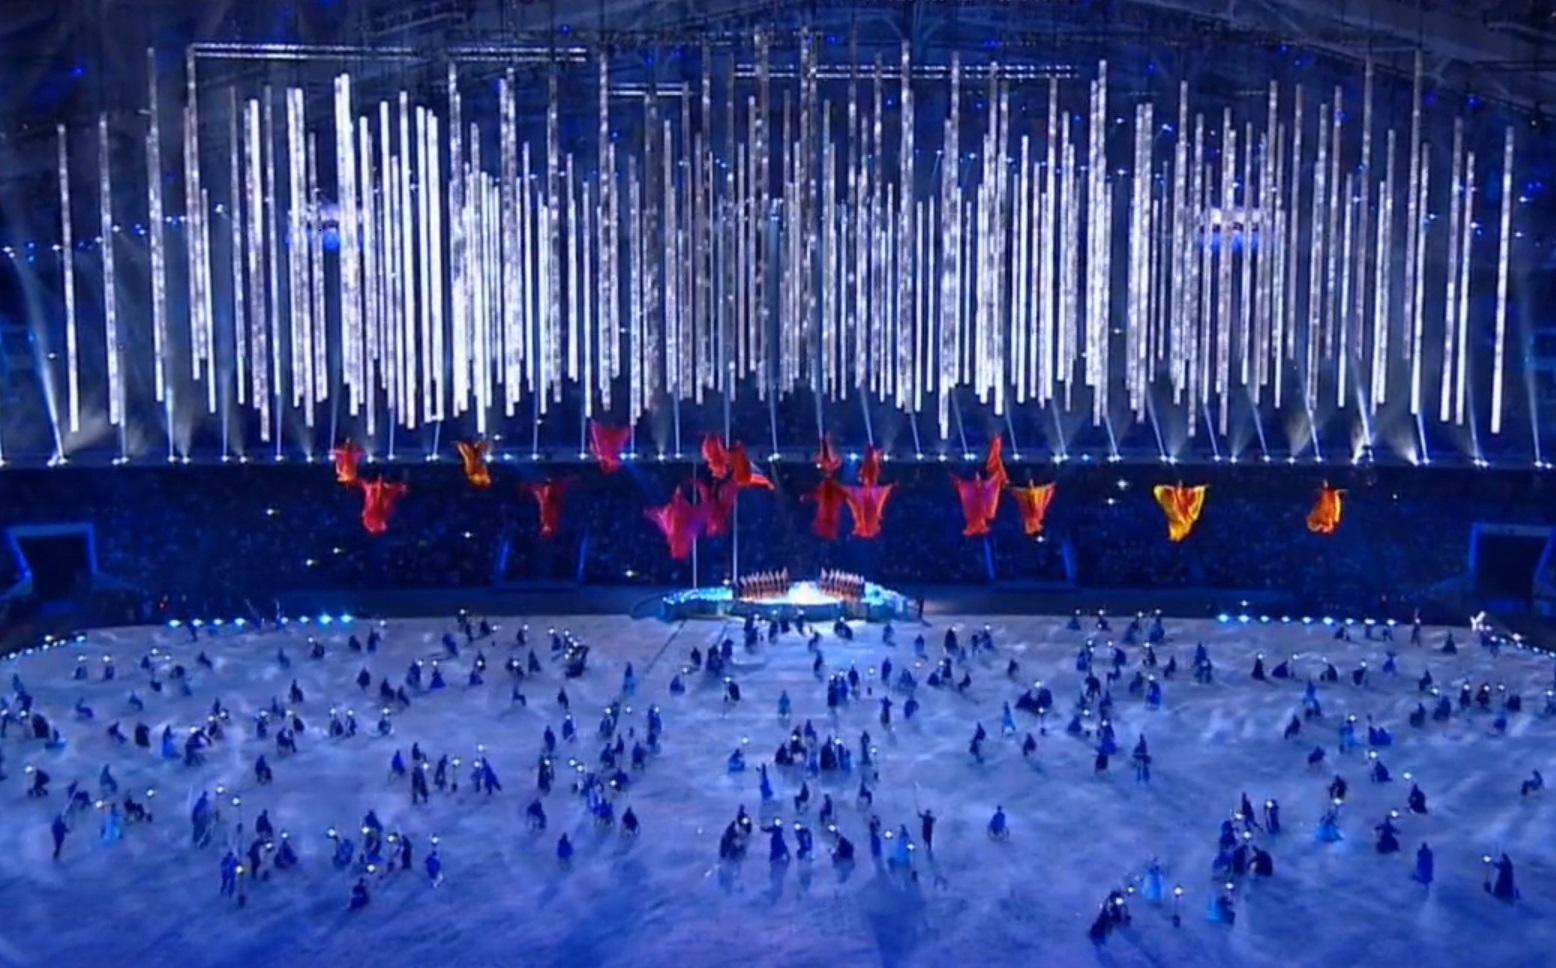 SOCHI WINTER OLYMPICS // 2014